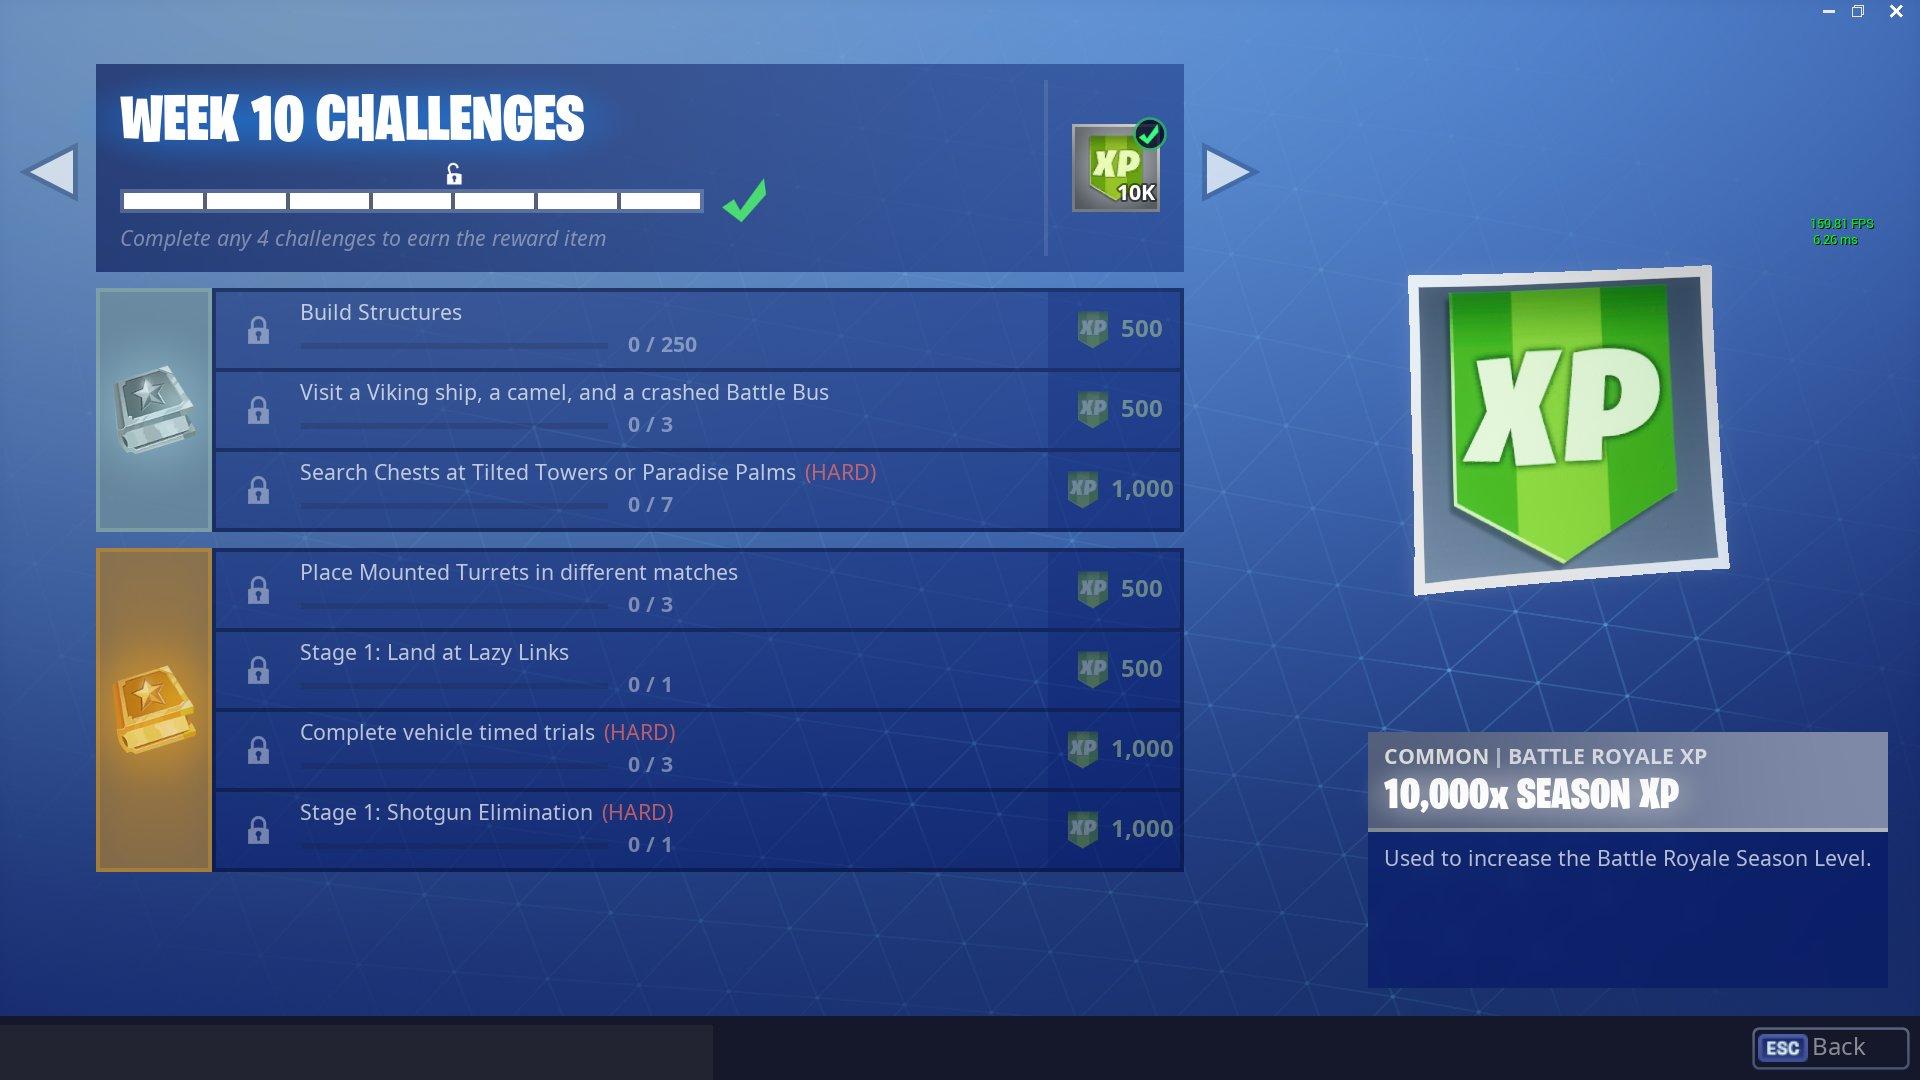 Fortnite Challenges for Season 6, Week 10